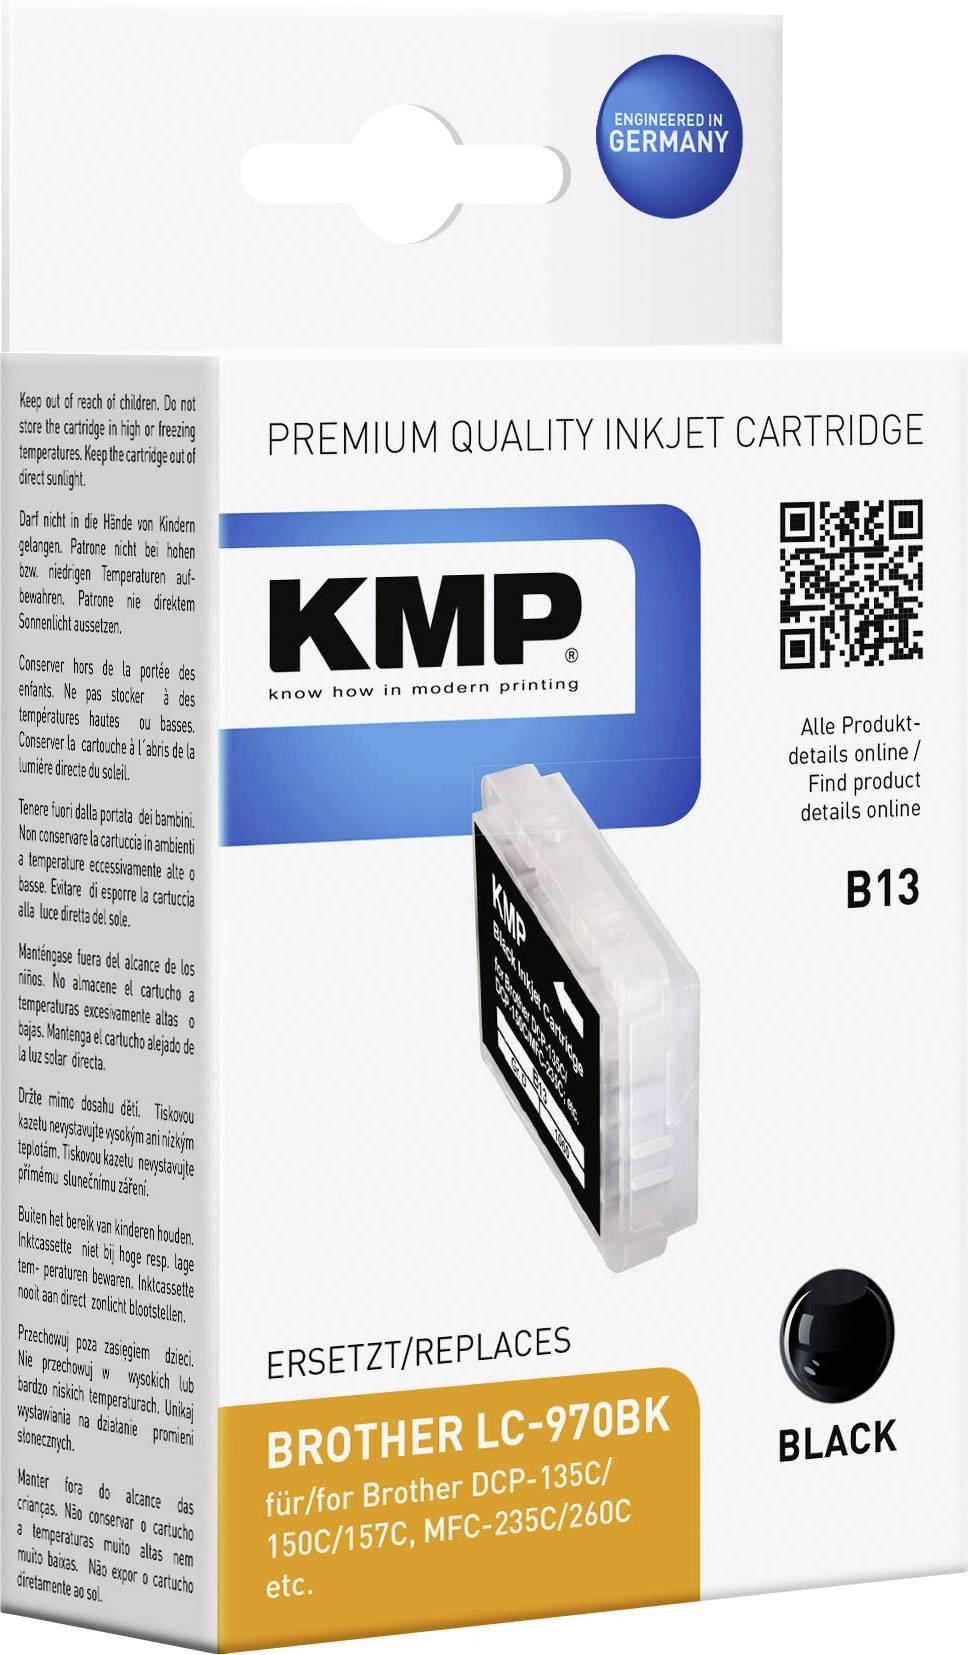 Toner inject KMP B13 = BROTHER LC-970BK